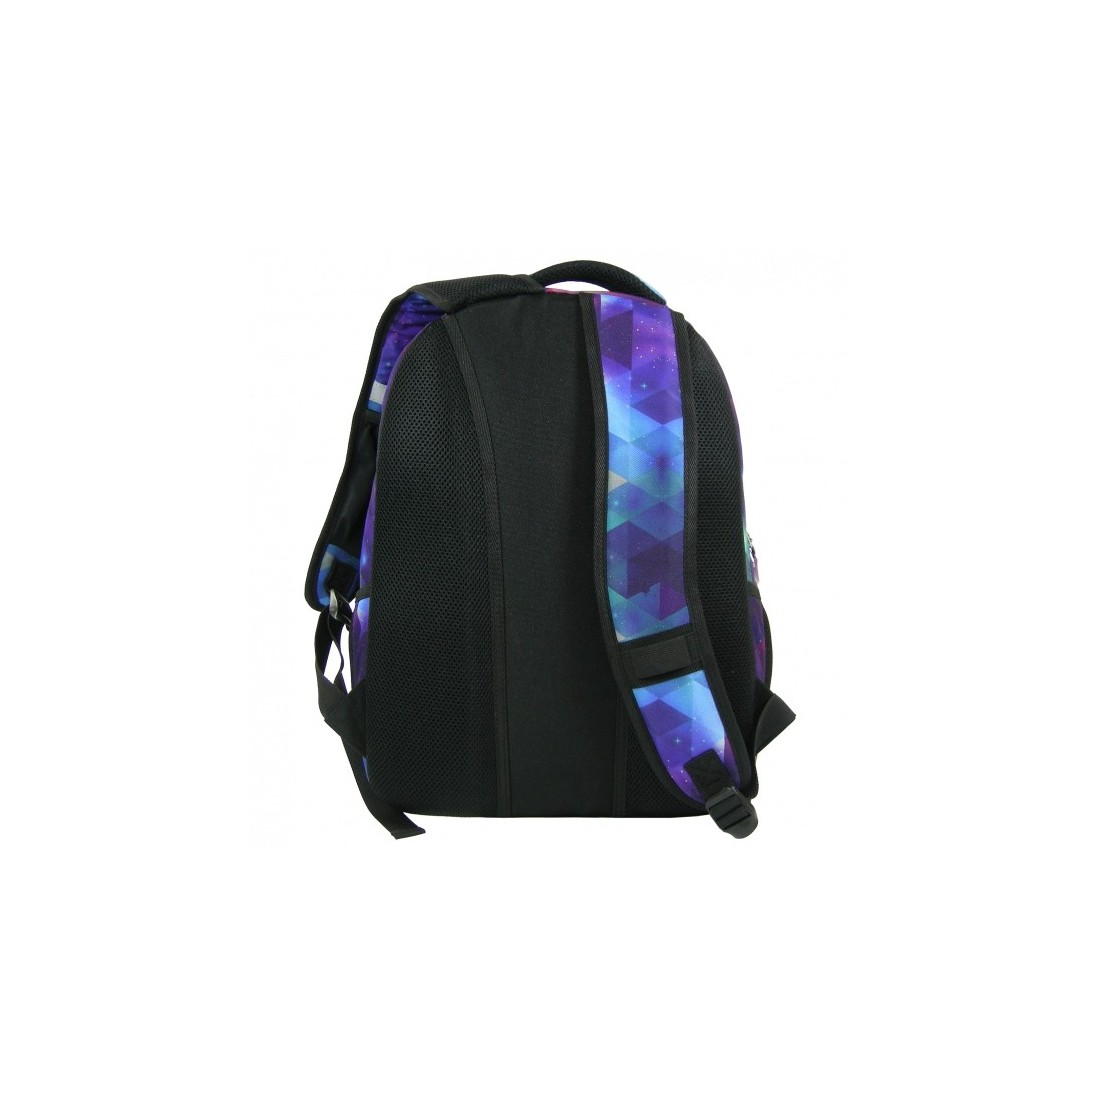 Plecak młodzieżowy galaxy colors - plecak-tornister.pl